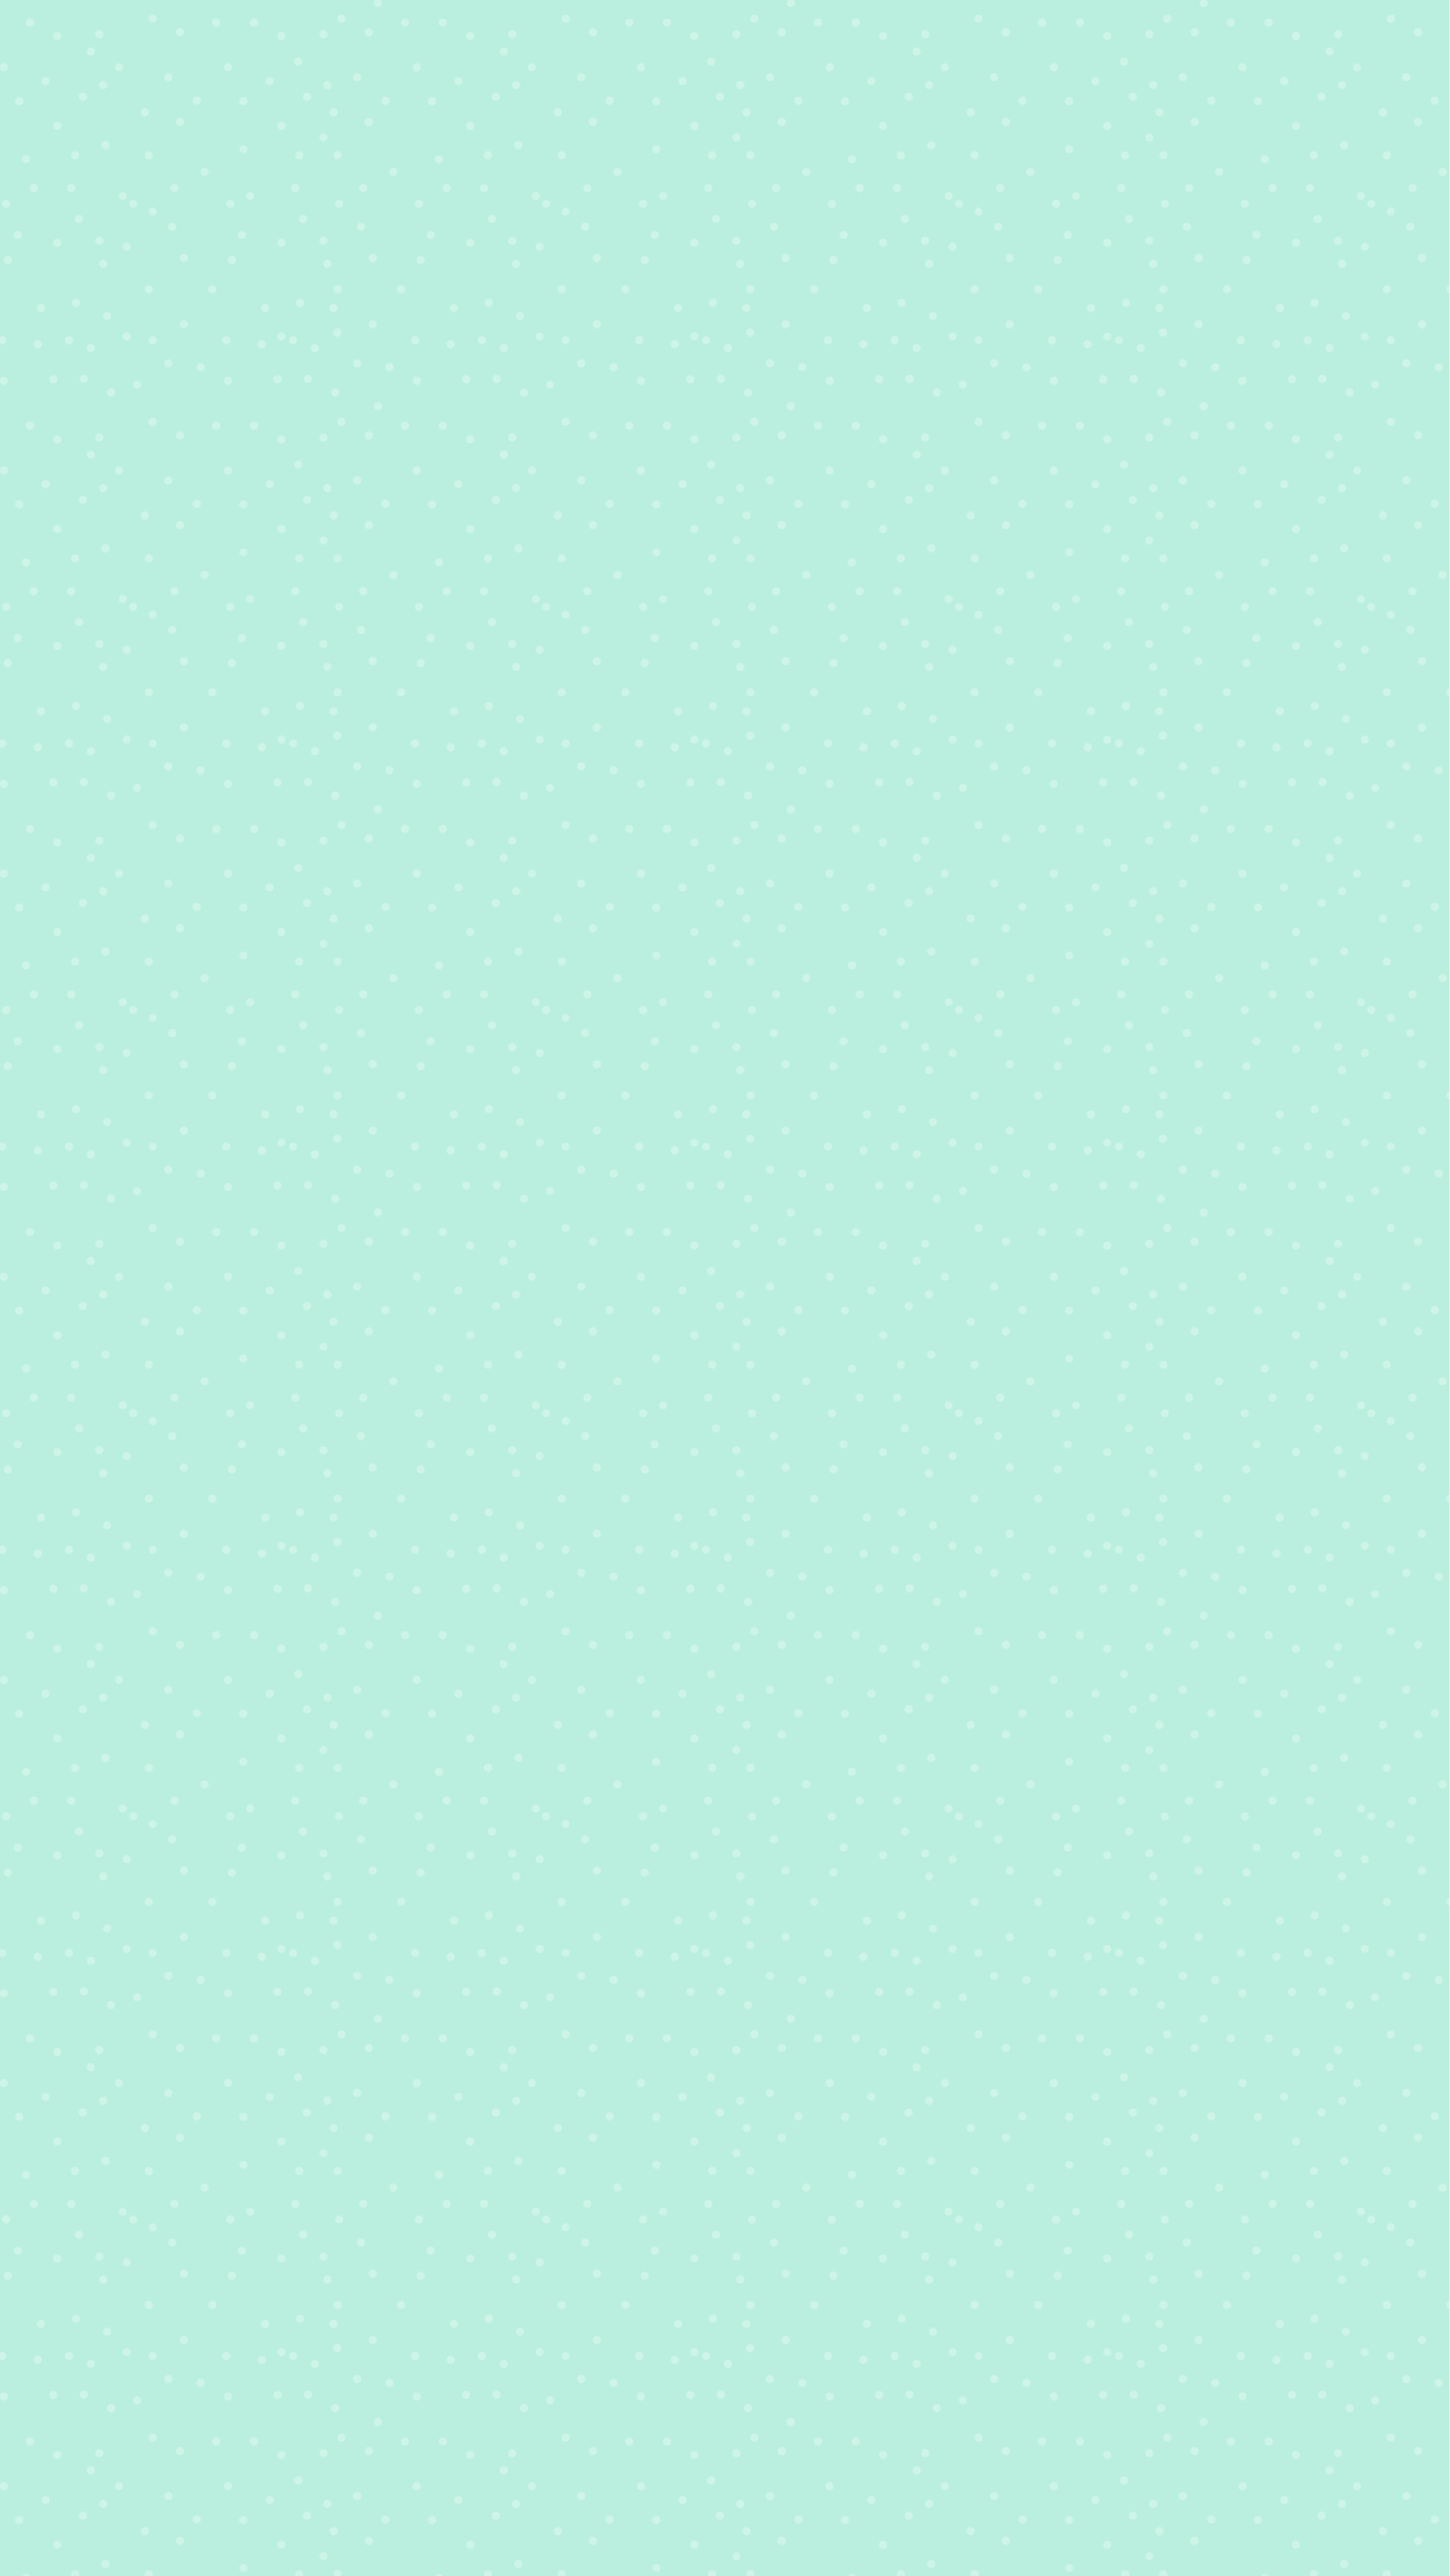 Fabulous March 2018 Spring Flower Calendar Wallpaper Sarah Hearts Download Free Architecture Designs Lukepmadebymaigaardcom